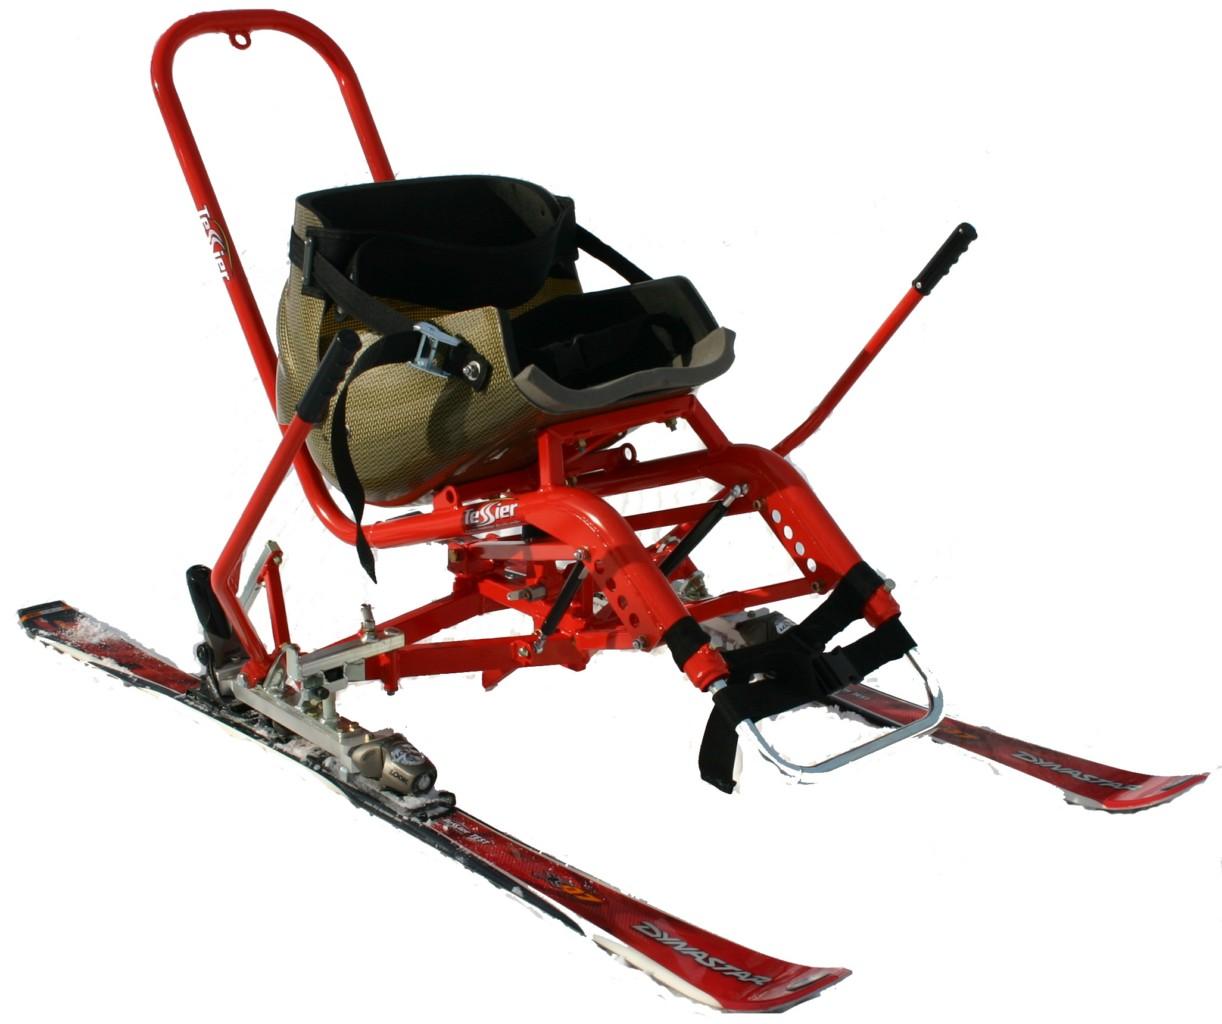 1d3ce03a2f tessier Kartski adaptive disabledgear.com (Full Size). Adaptive Nordic  Cross Country skiing ...